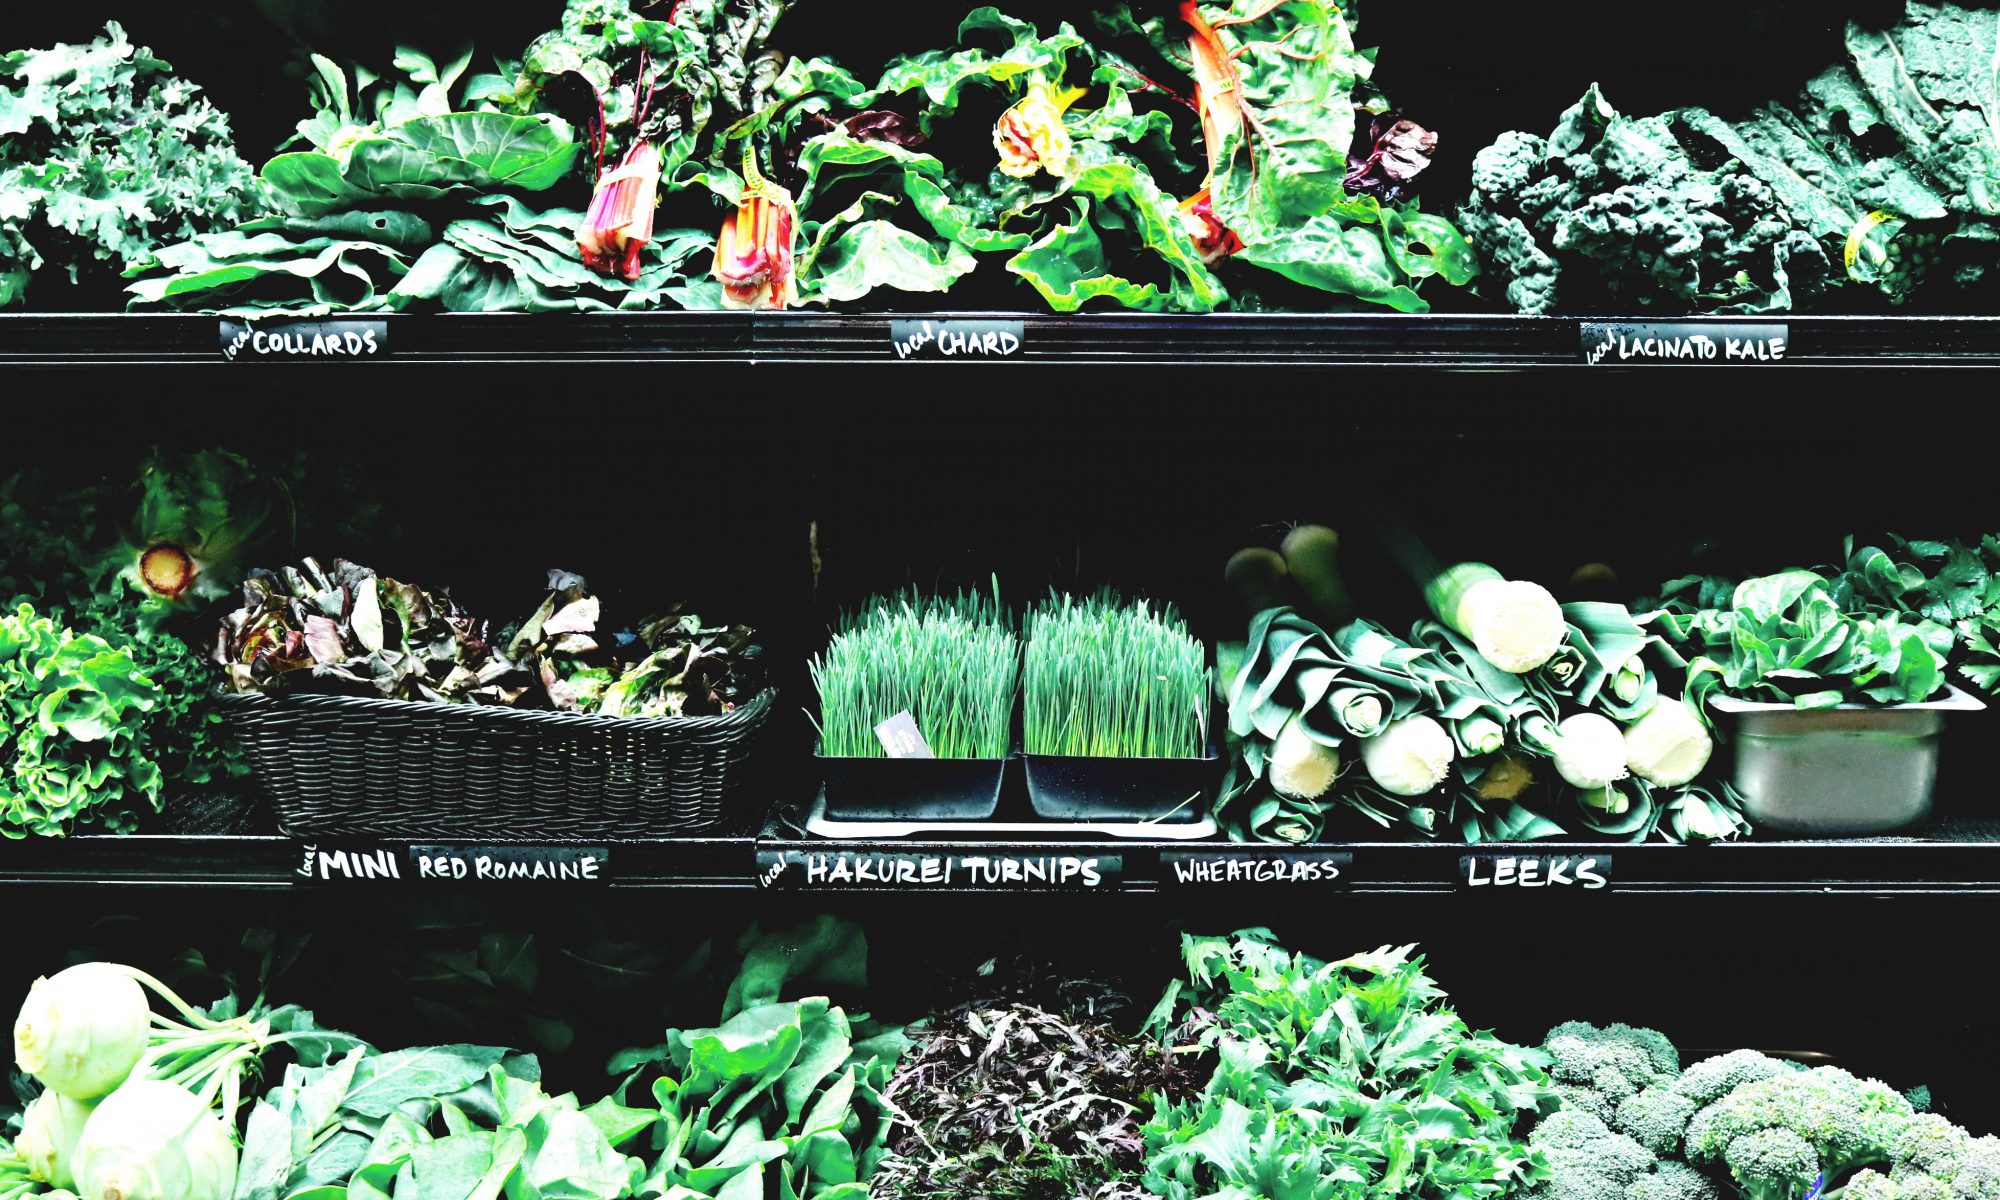 Image: On the background, various vegetables, collards, chard, lacinato kale, mini red romaine, hakurei turnips, wheatgrass, and leeks, on shelves.